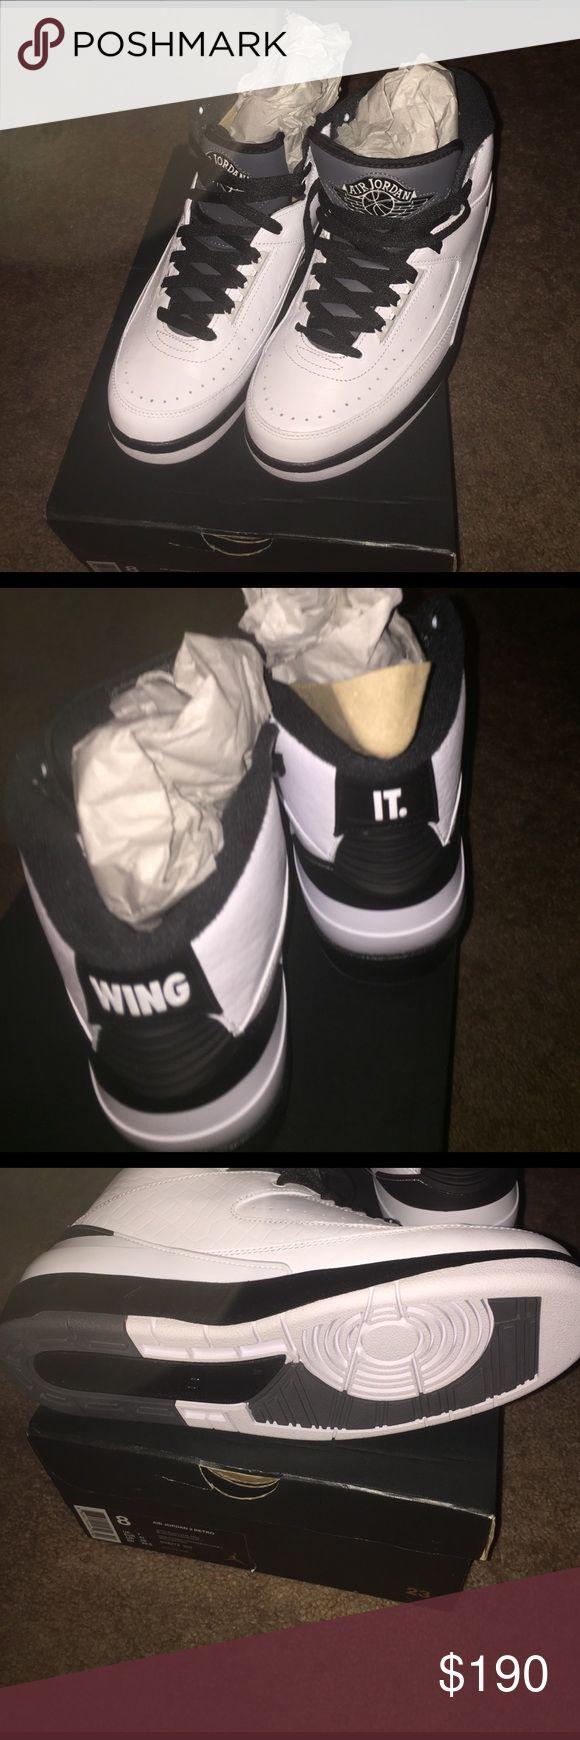 Air Jordan retro 2 Nike Brand new never worn black and white retros #2 Jordan Shoes Athletic Shoes